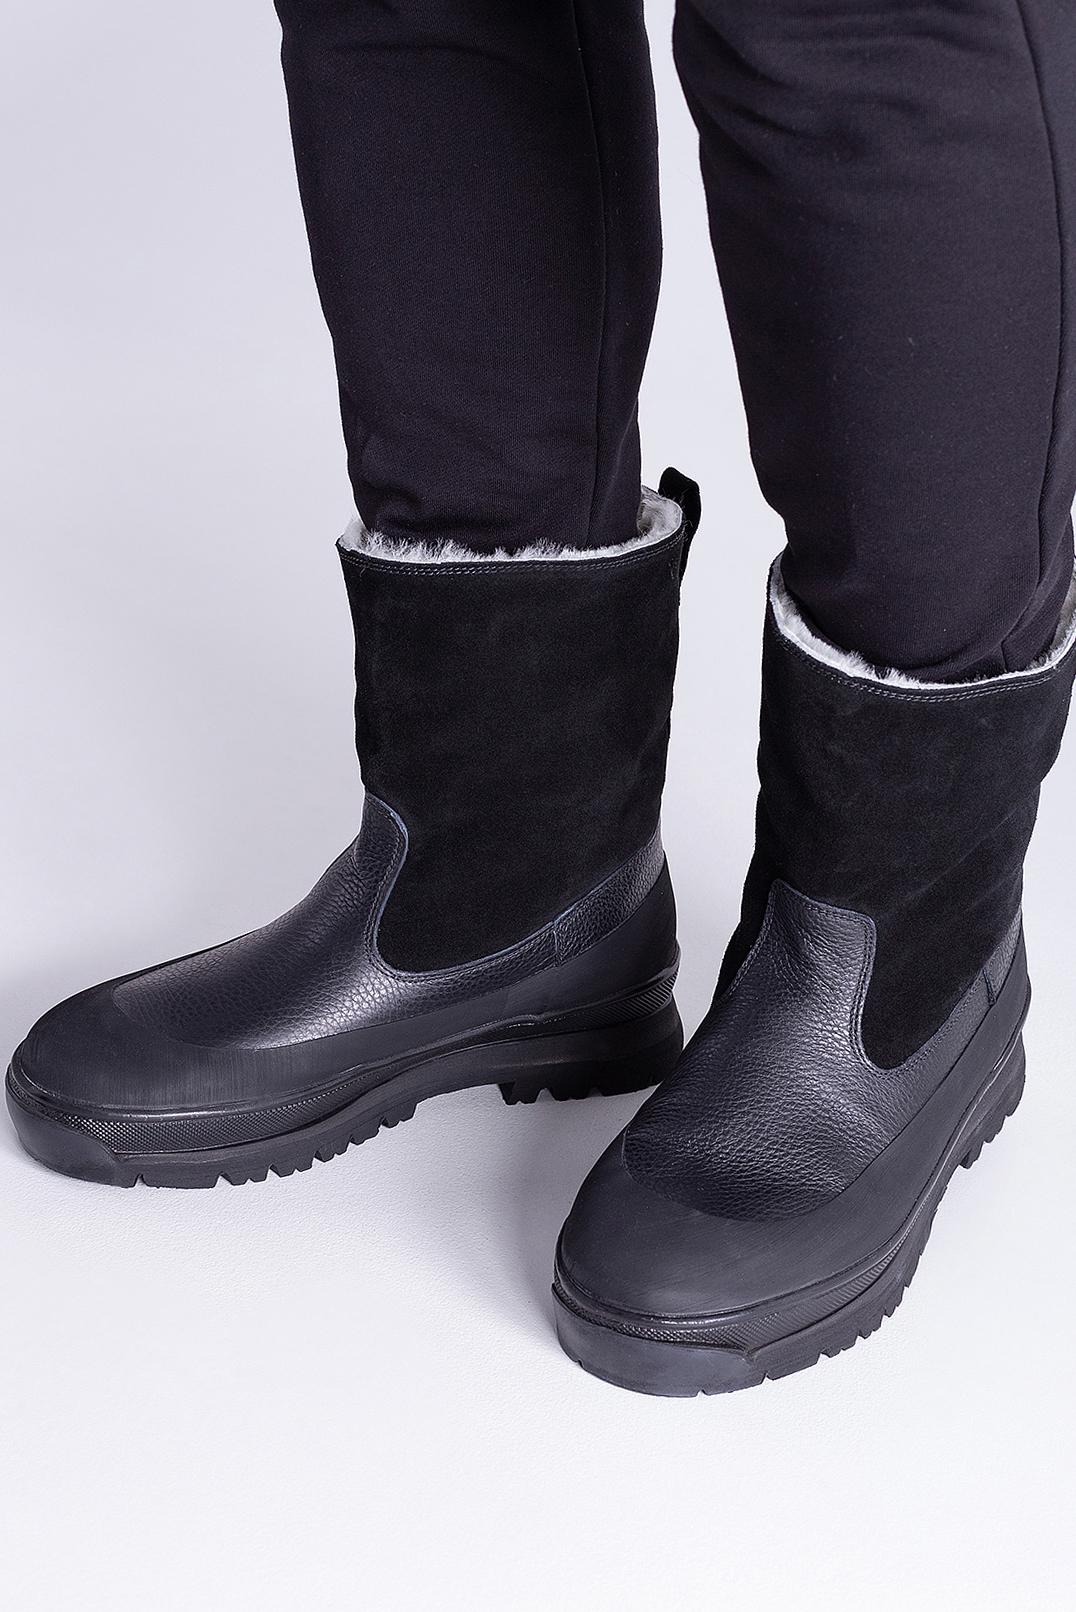 Ботинки на меху STONE ISLAND STm29030